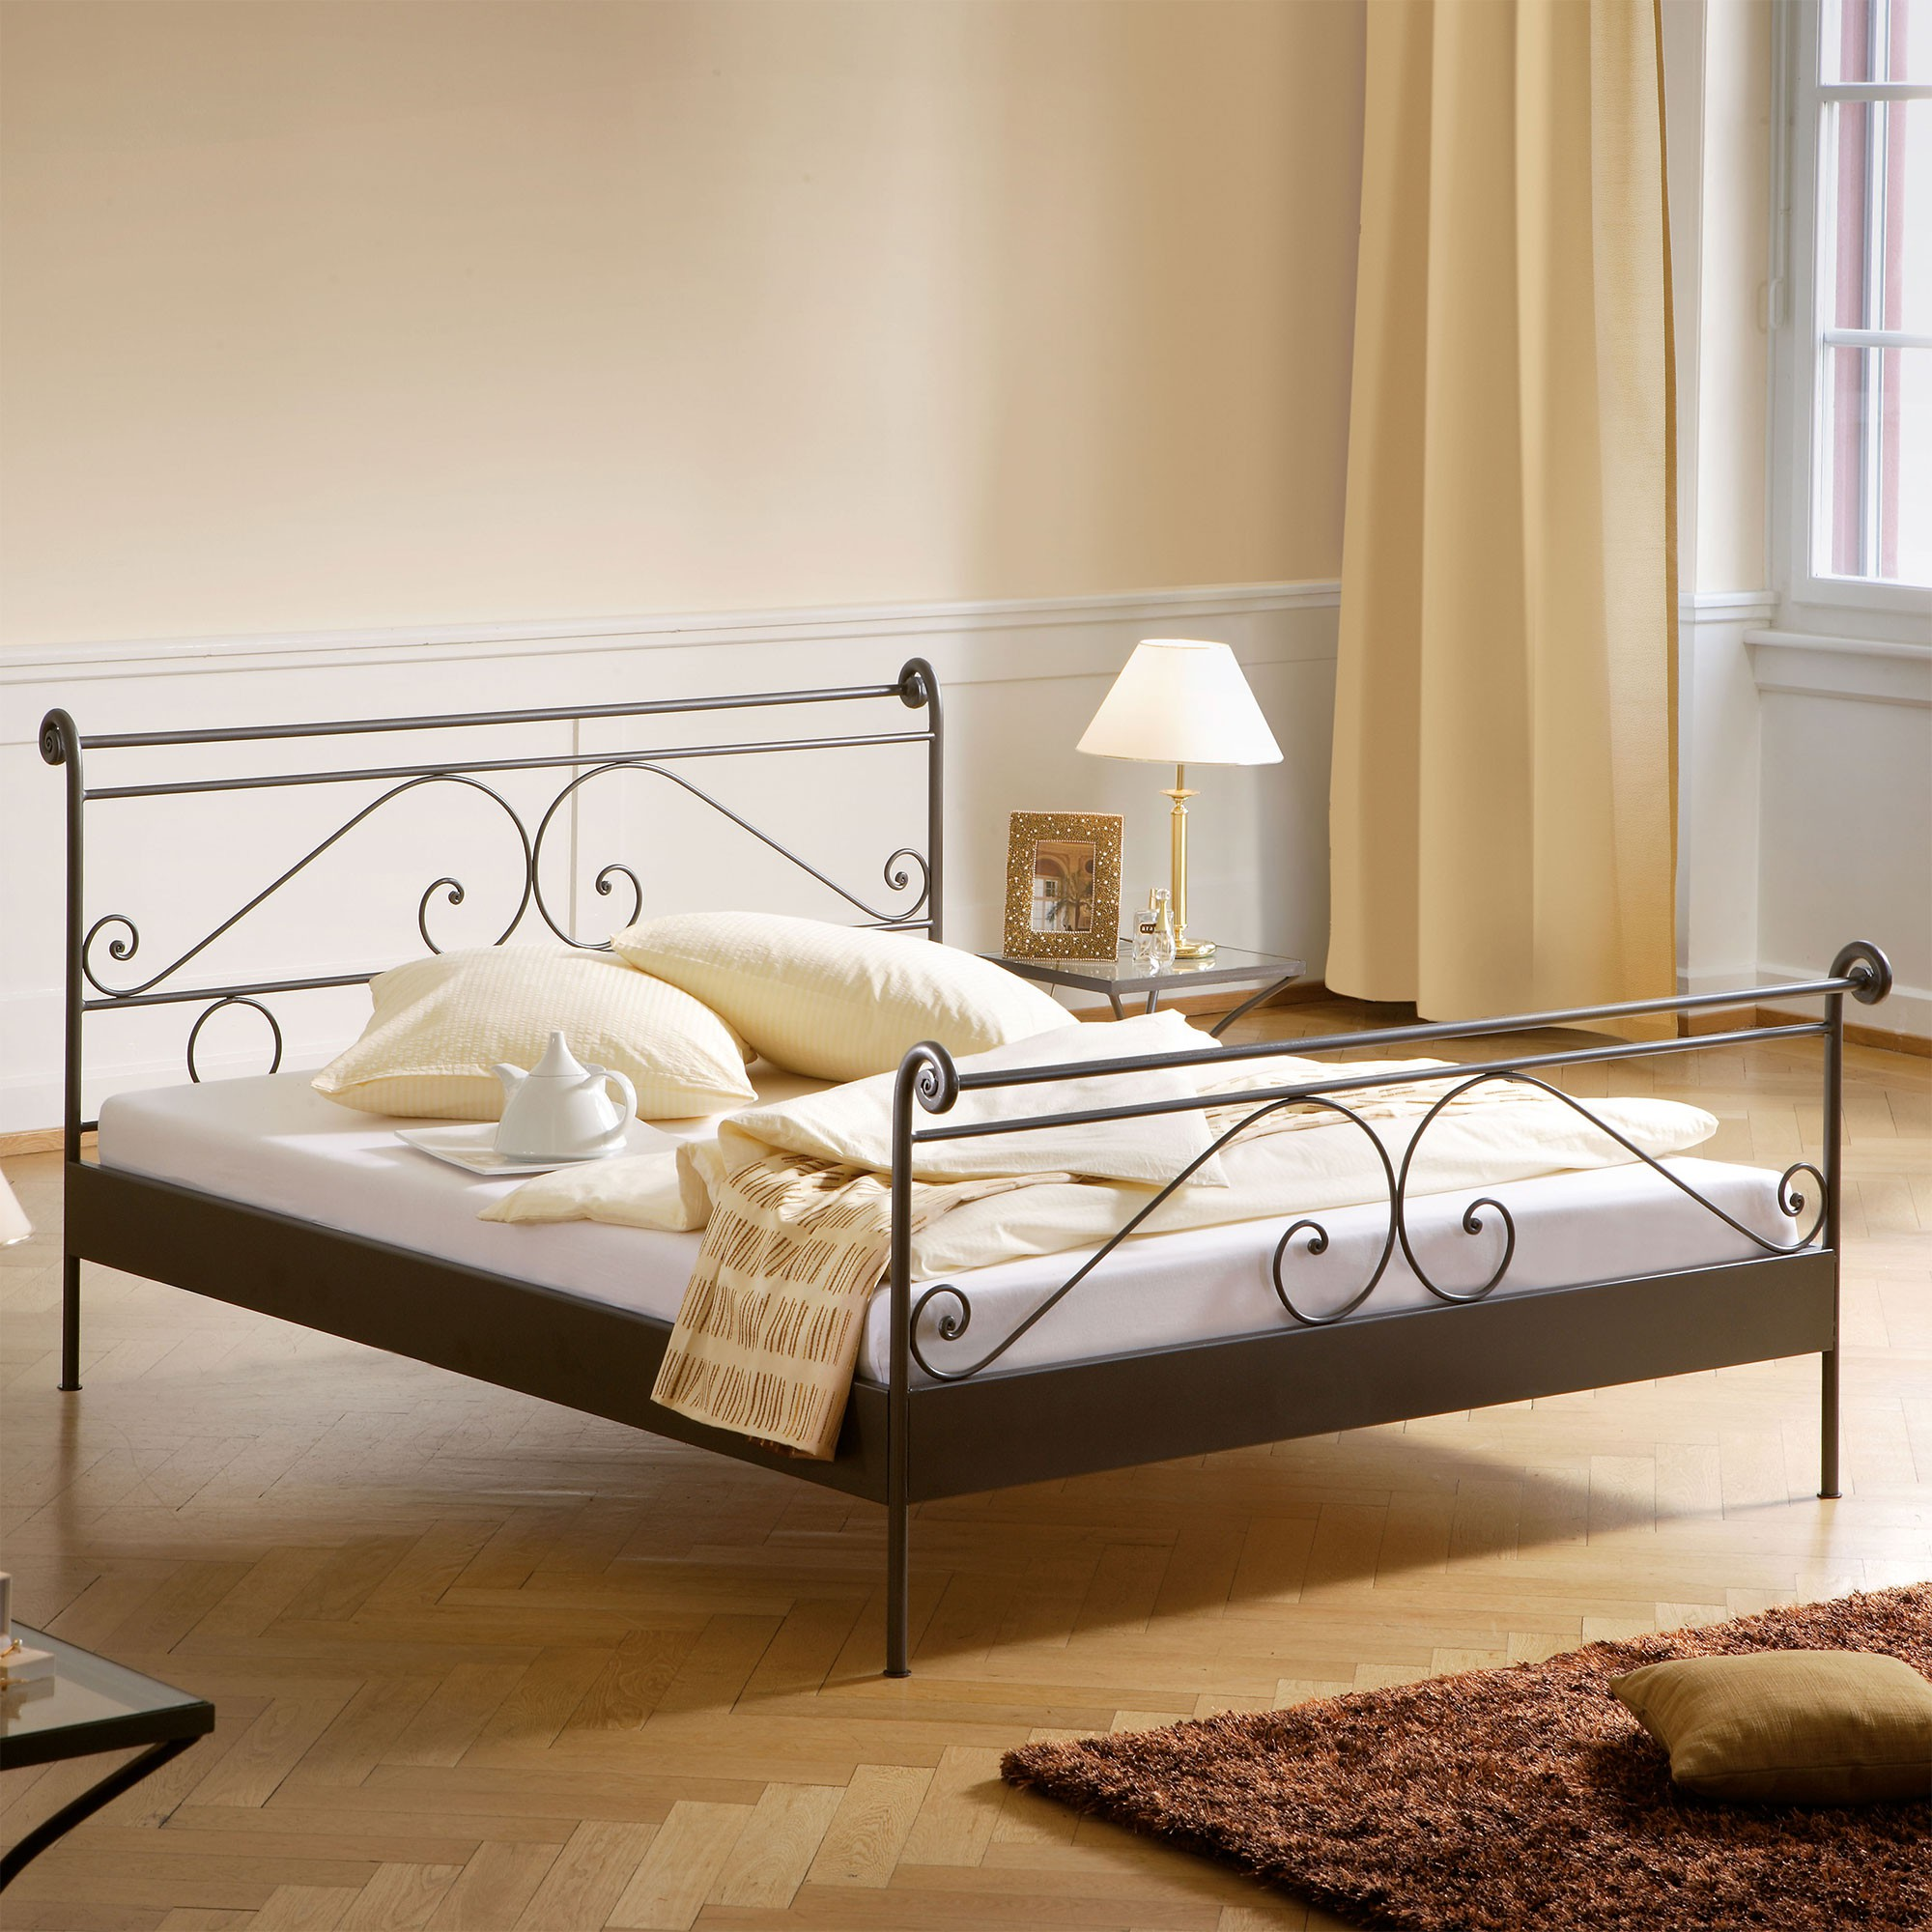 Full Size of Hasena Selection And Romantic Metallbett Cerete Online Kaufen Belama Bett Weiß 100x200 Betten Wohnzimmer Metallbett 100x200